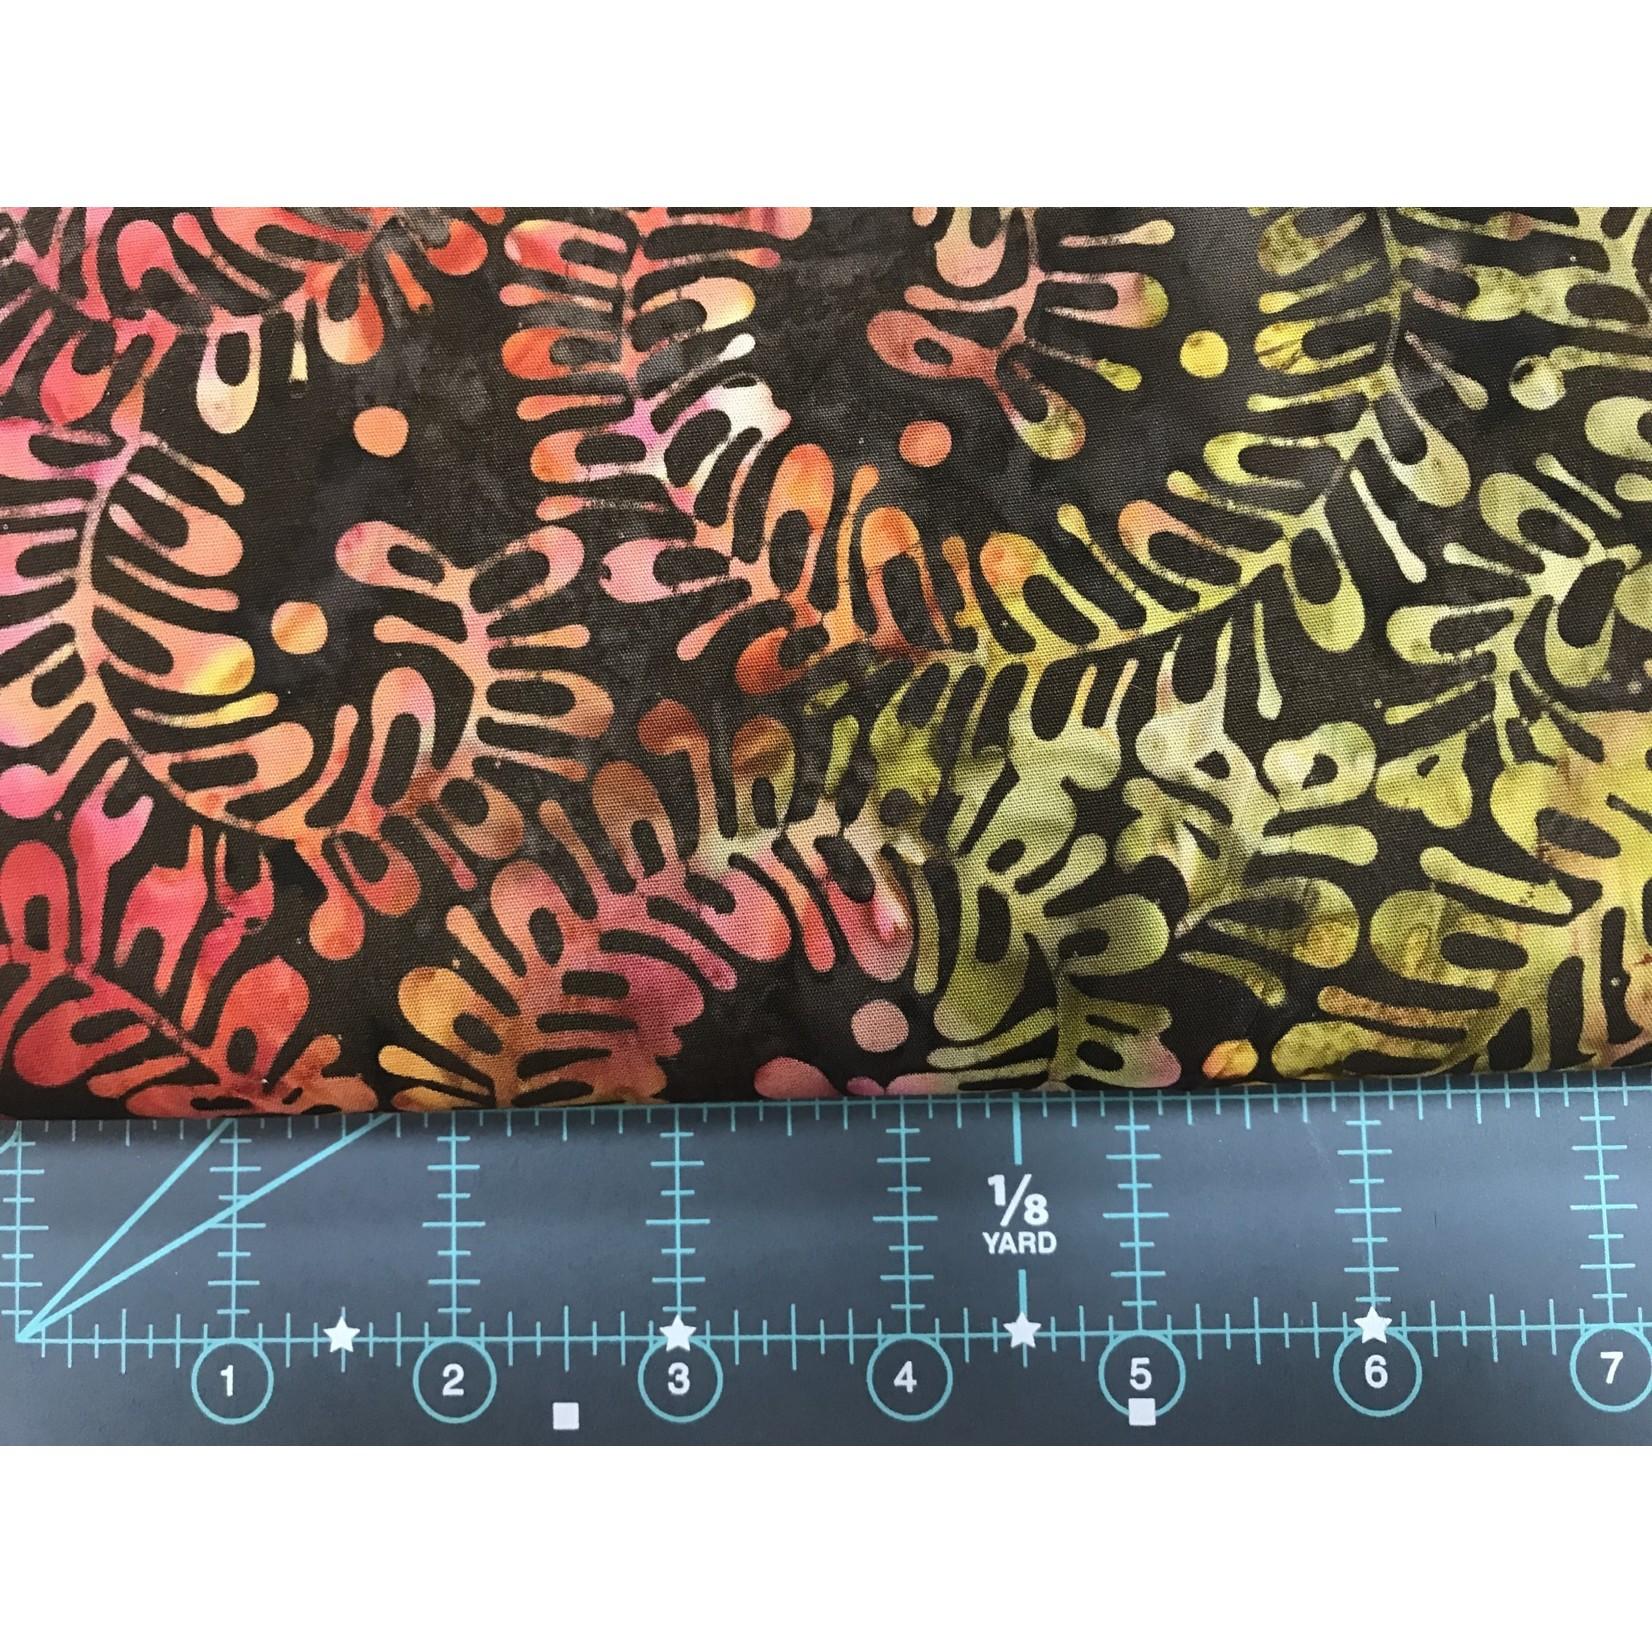 Trend Tex 360cm PINK/ORANGE/MOSS on BROWN BATIK  $16.M